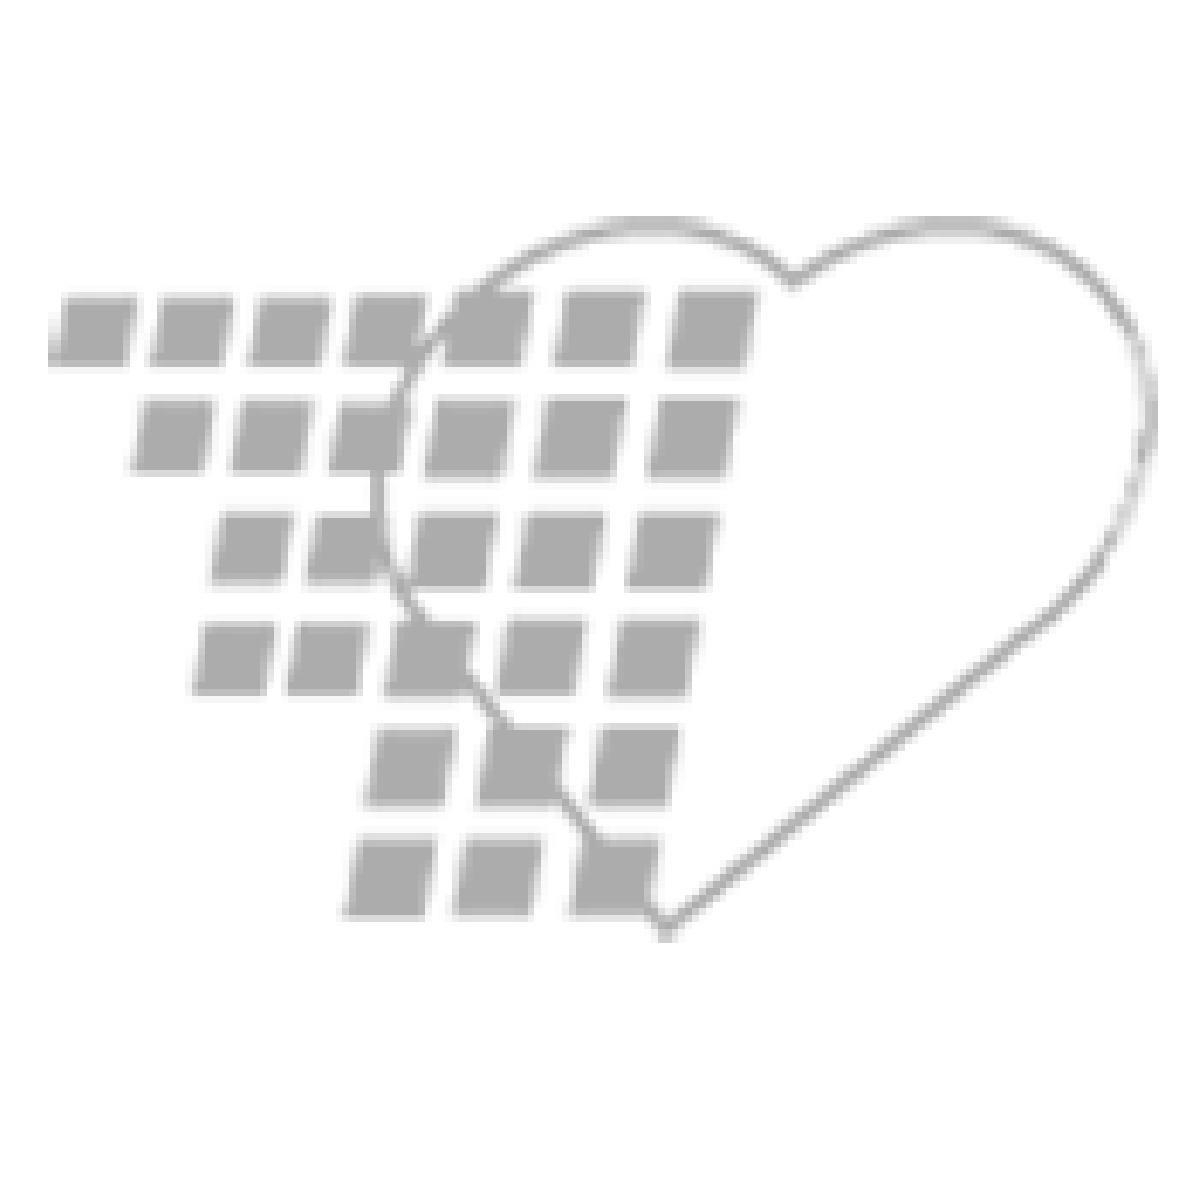 06-93-1337 - Demo Dose® Diphenhydramin 12.5mg/5mL Pint